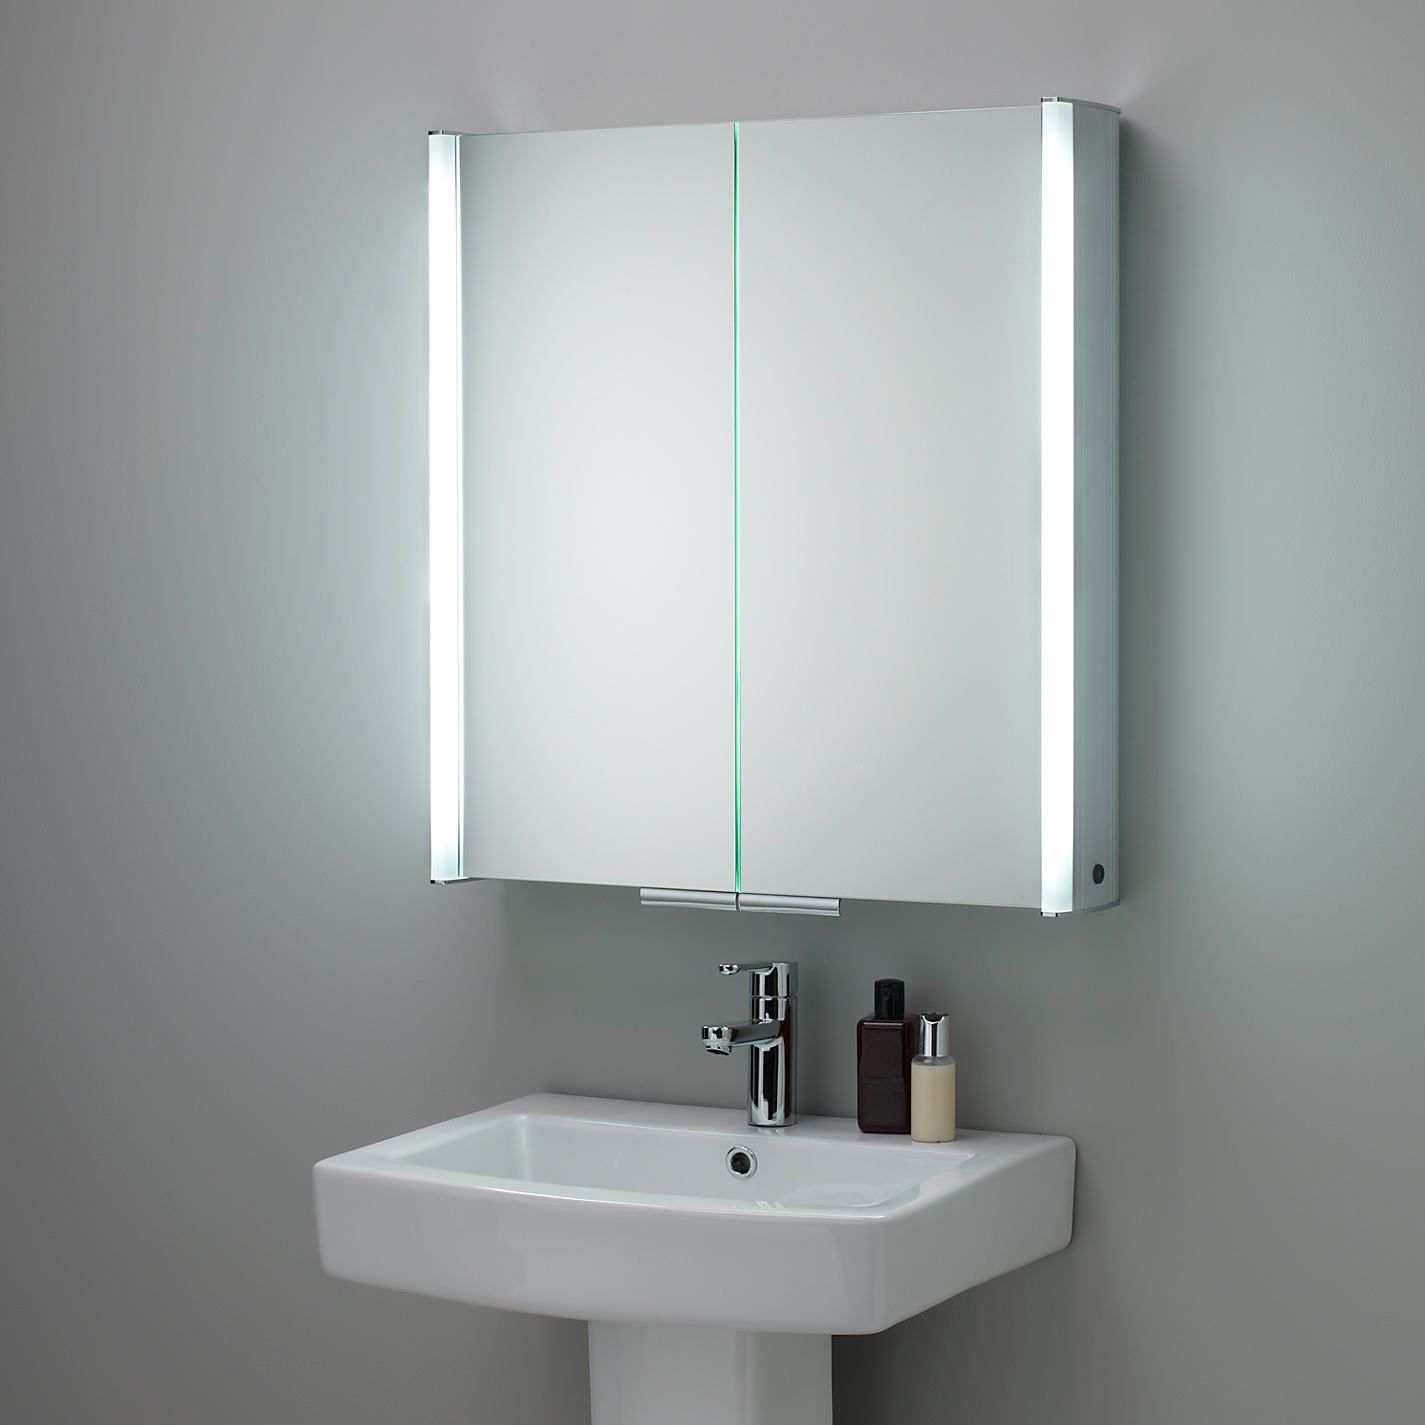 Bq Bathroom Cabinets With Shaver Socket New